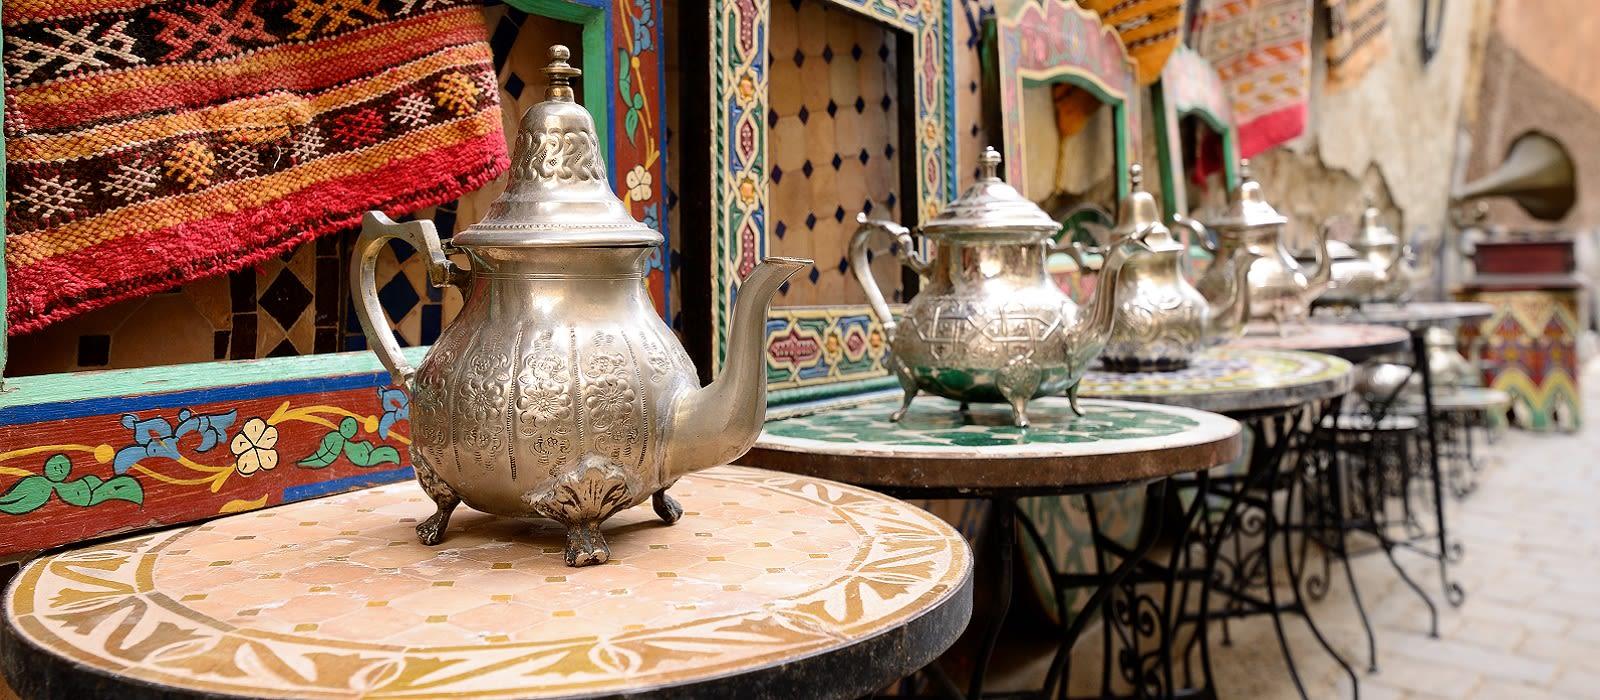 Marokko: Königsstädte & Bergwelten Urlaub 7